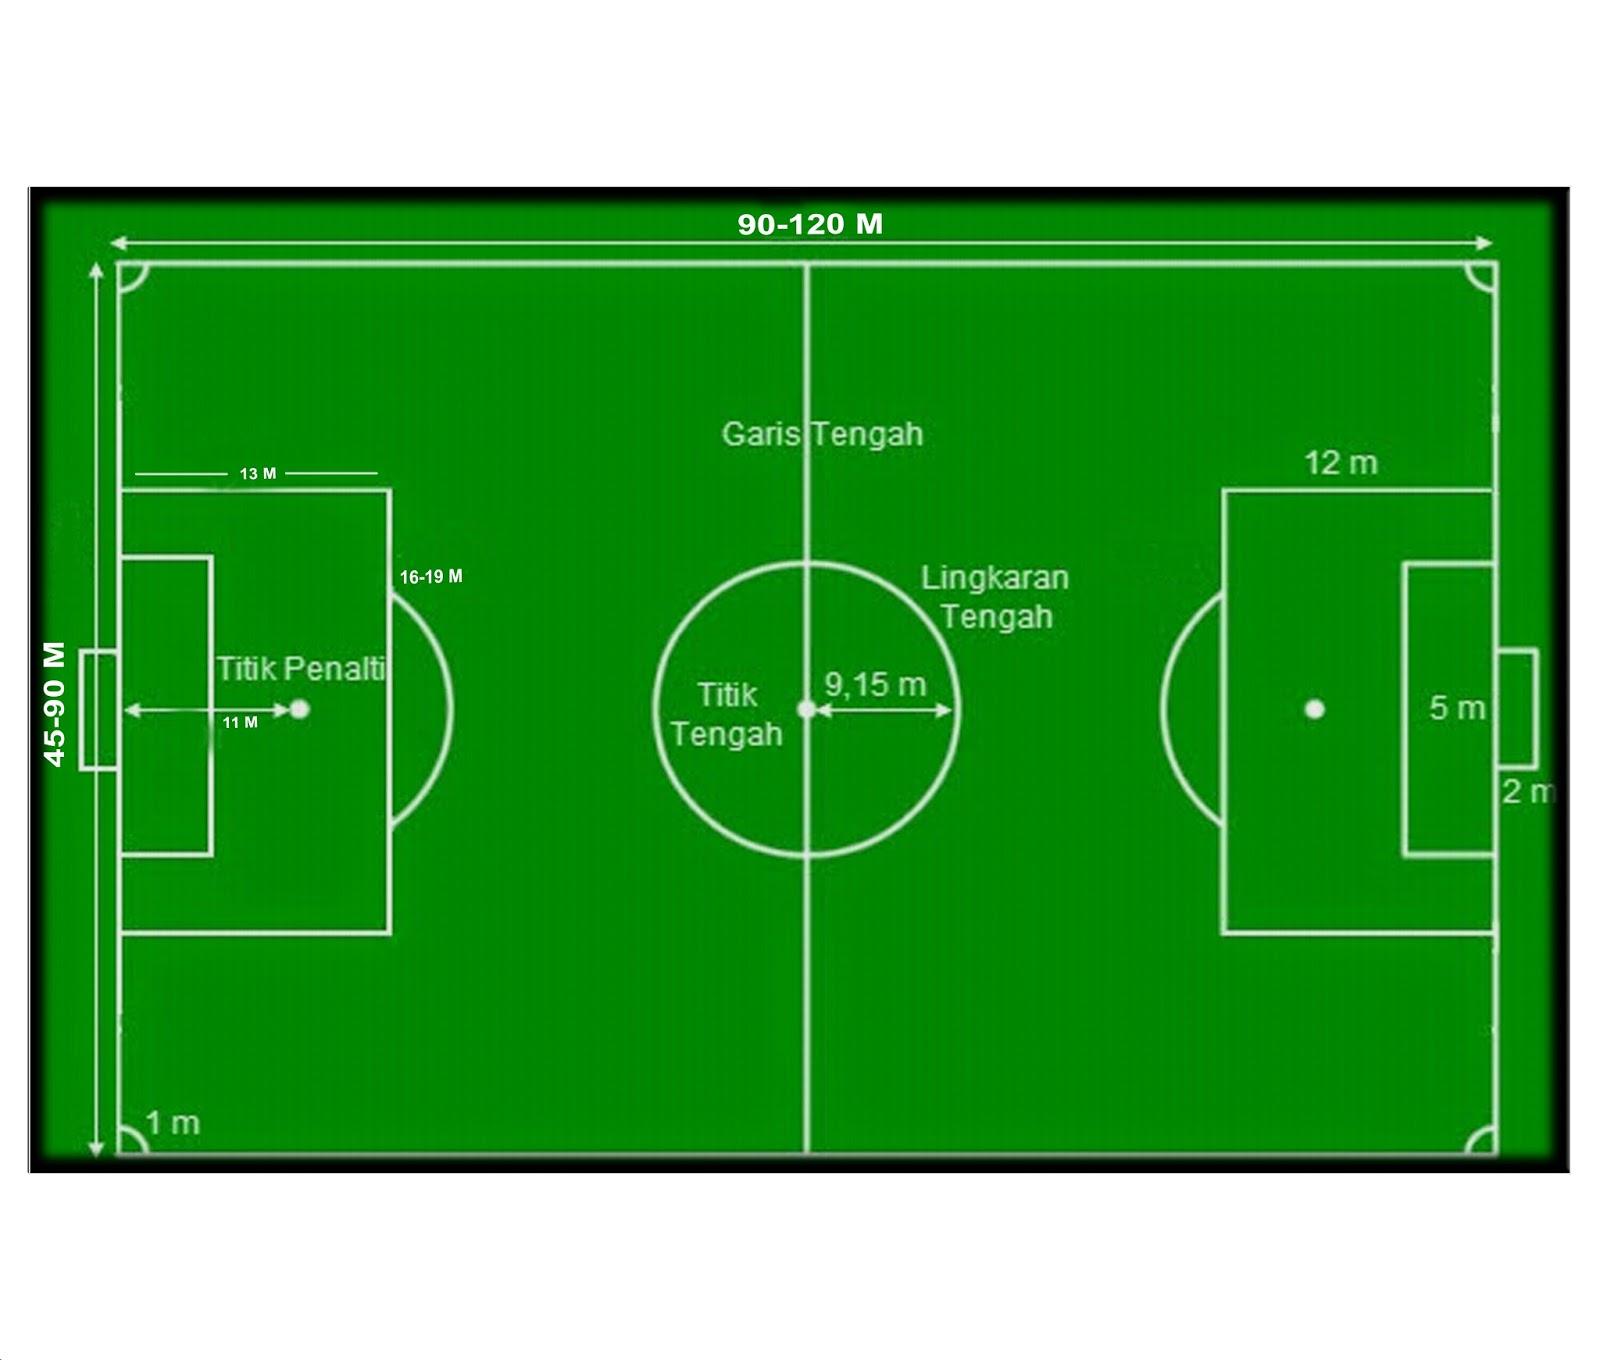 Gambar Lapangan Sepak Bola Dunia Olahraga